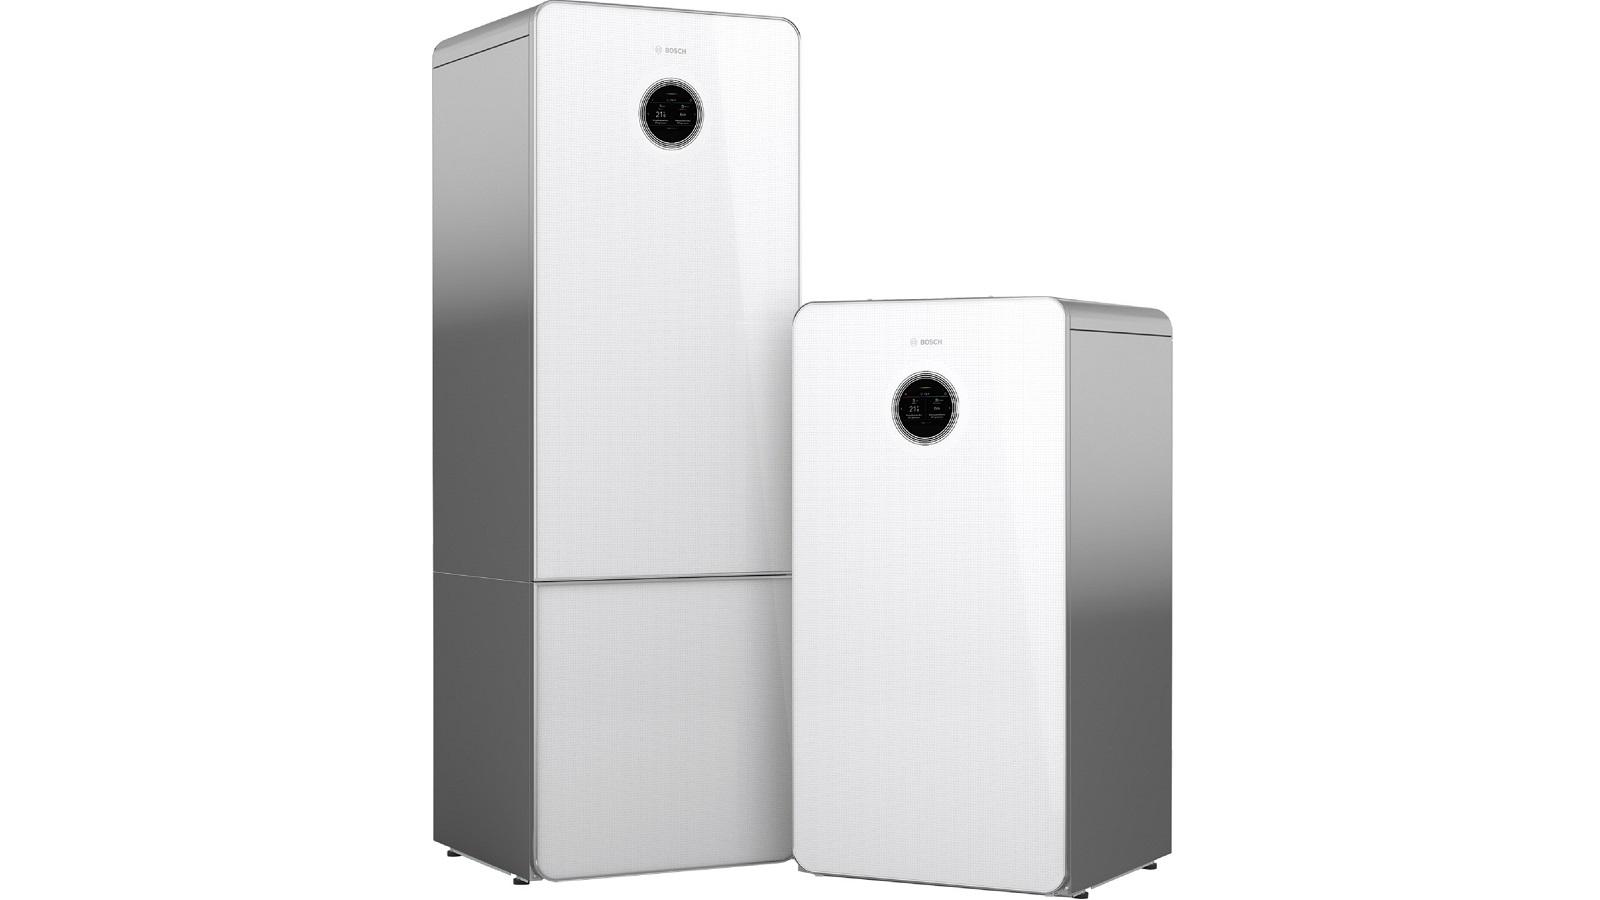 Bosch Compress 7800i LW brine heat pump